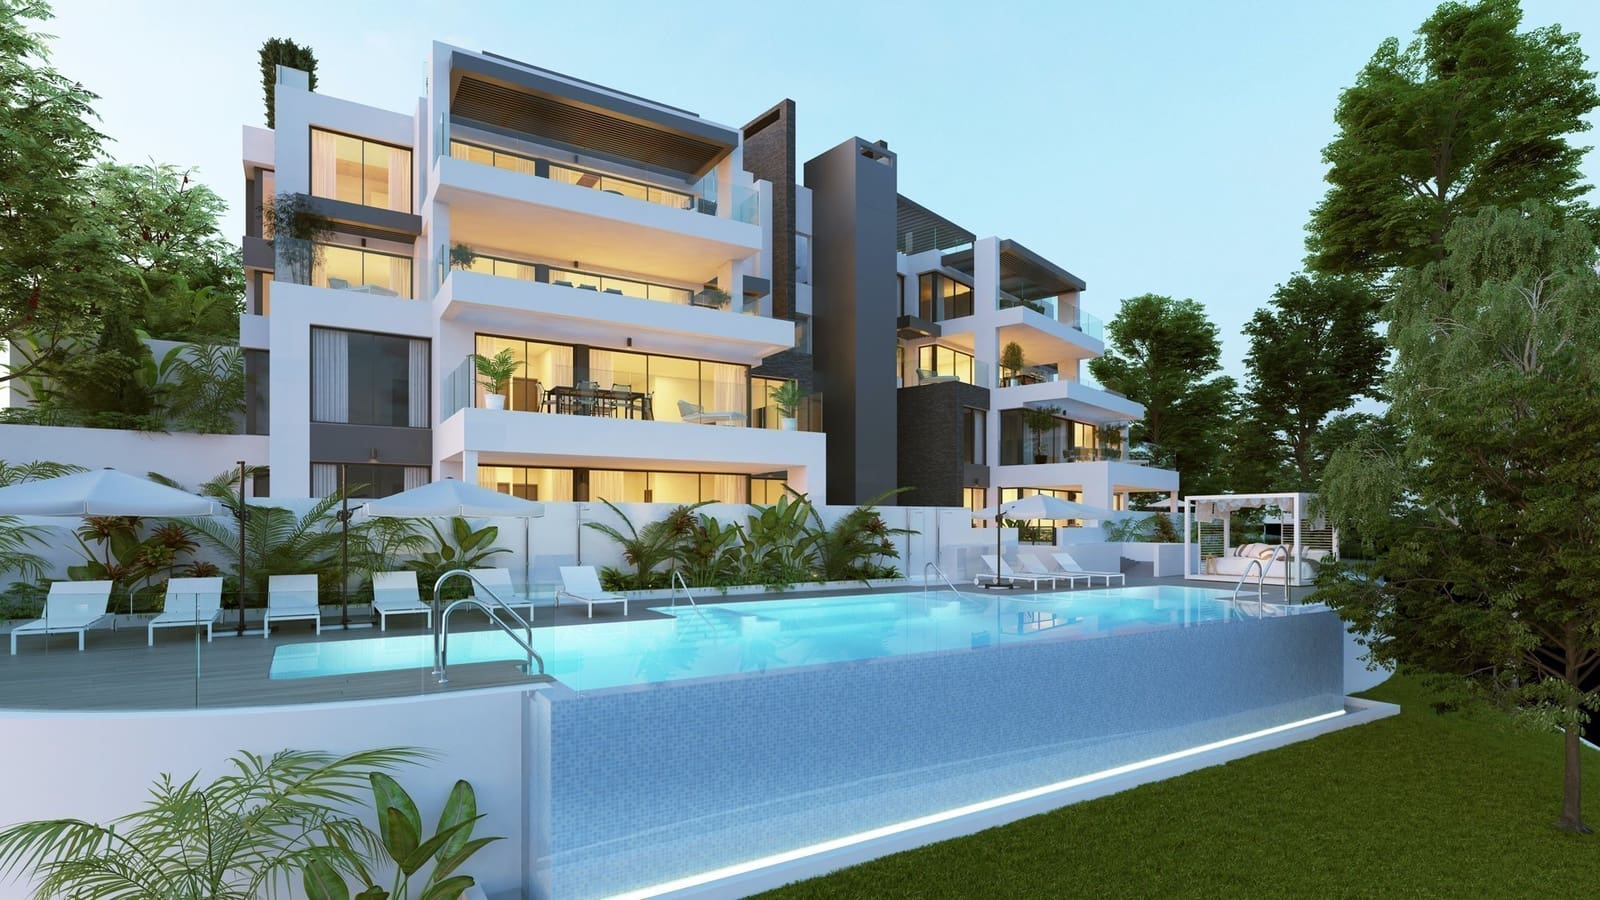 2 bedroom Apartment for sale in Benahavis with pool - € 575,000 (Ref: 5360685)